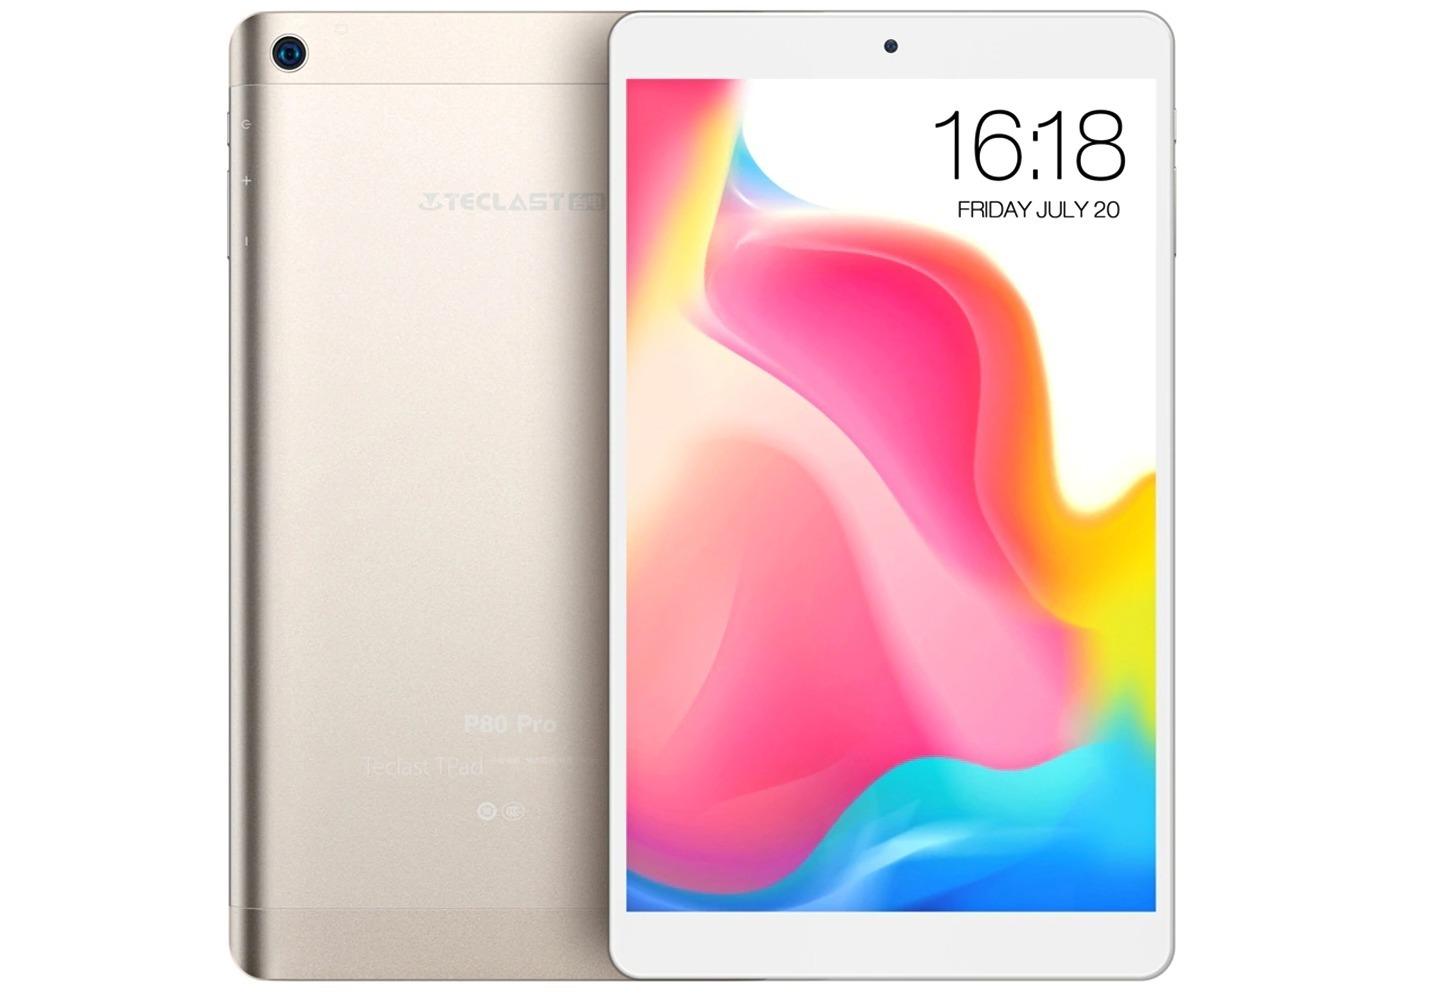 Fuori tutto tablet e notebook: si parte da soli 79 euro con coupon e consegna rapida